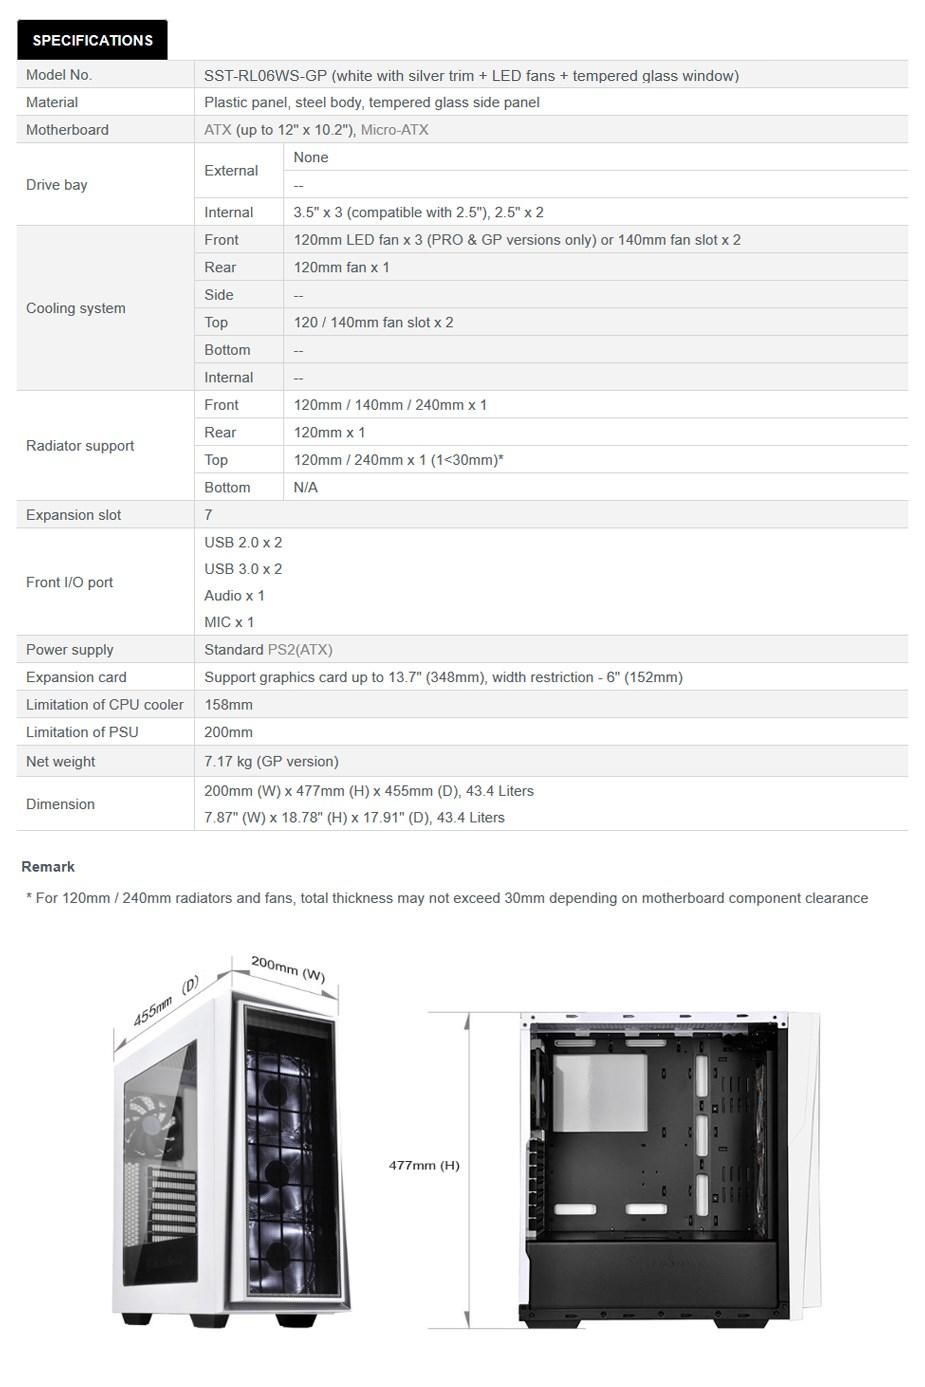 SilverStone Redline RL06 Pro Tempered Glass Mid-Tower ATX Case - White/Silver - Desktop Overview 1